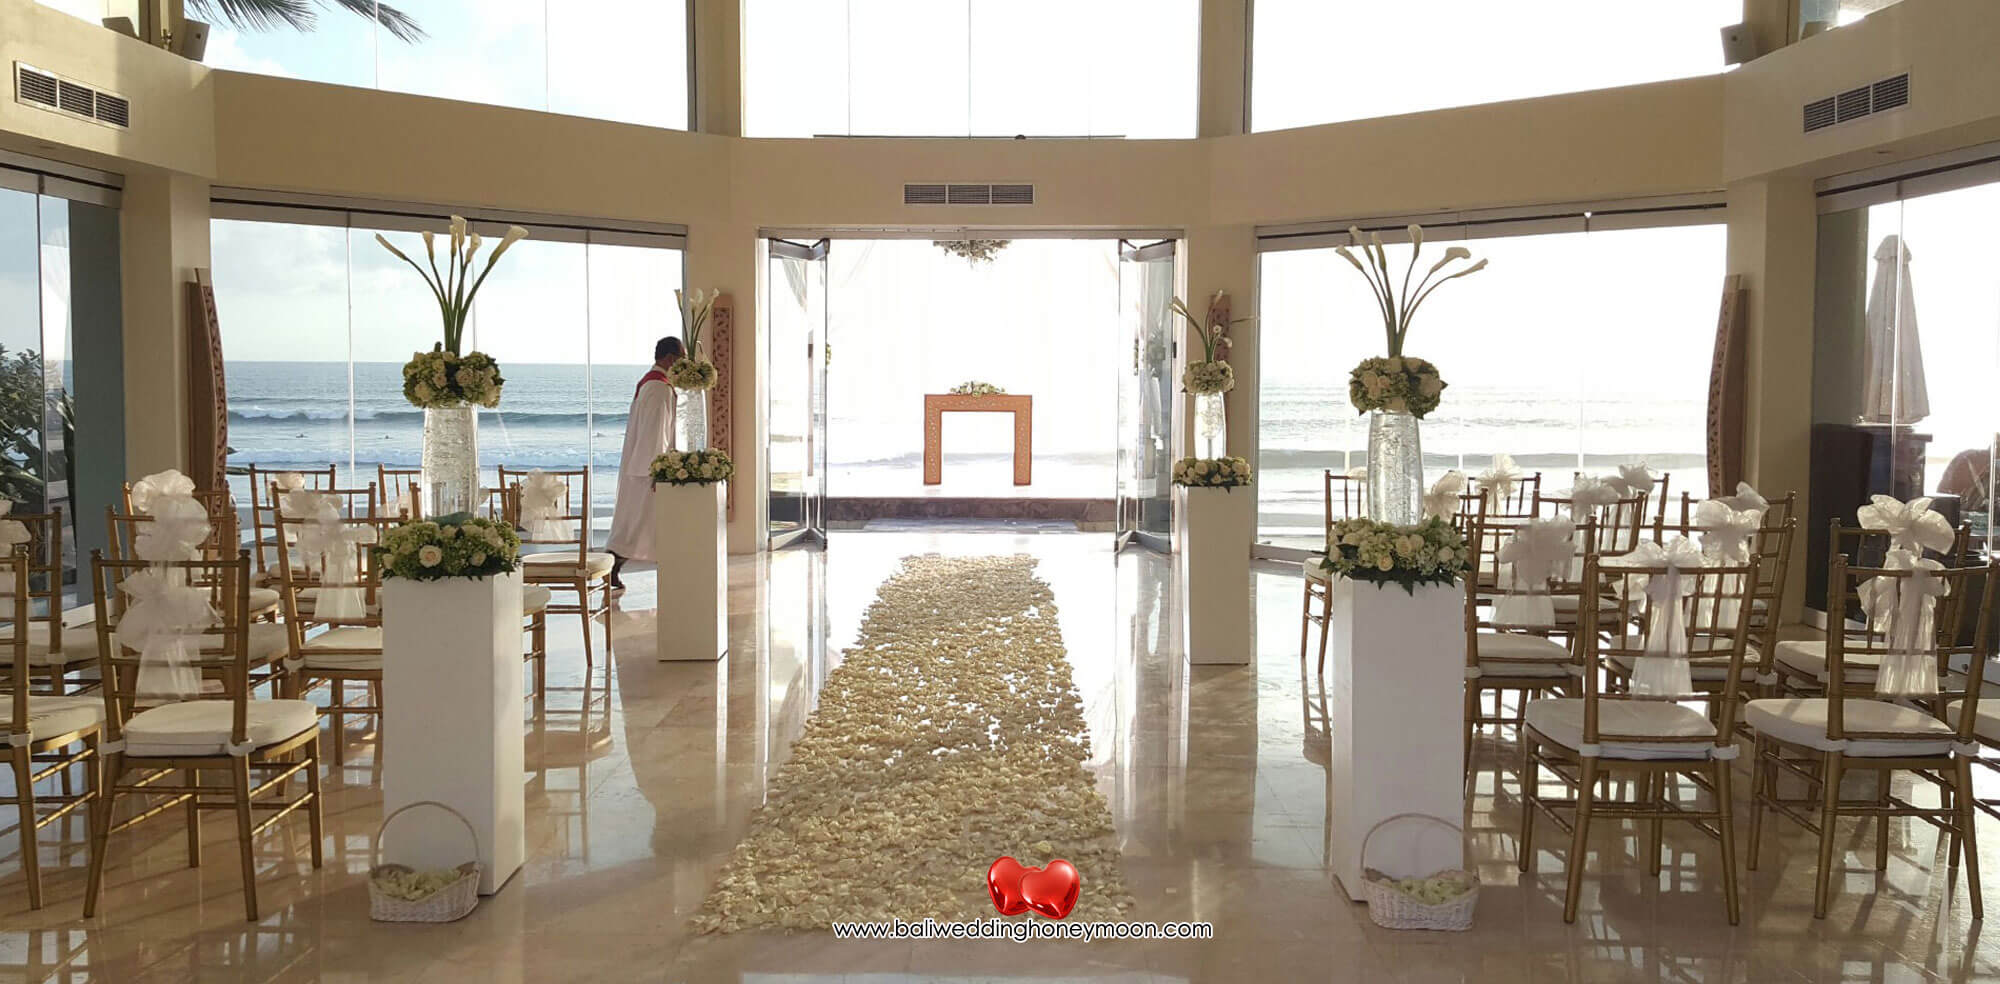 theseminyakpurnamabali-weddingvenuebali-baliwedding-baliweddinghoneymoon-baliweddingorganizer-baliweddingplanner-baliweddingpackage5